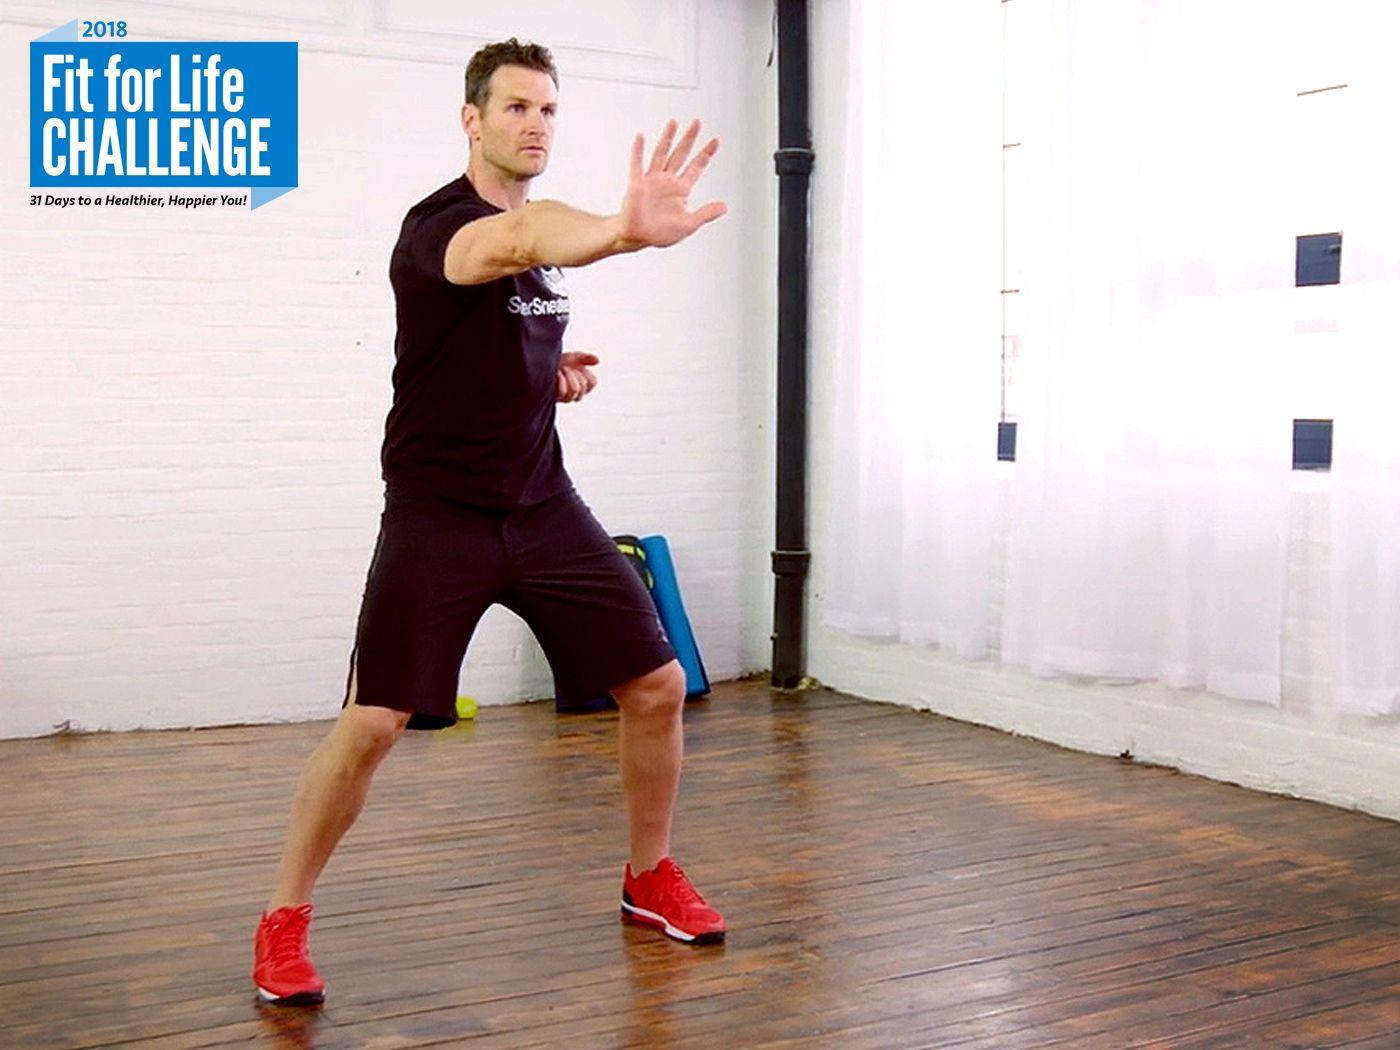 fitness expert David Jack shows